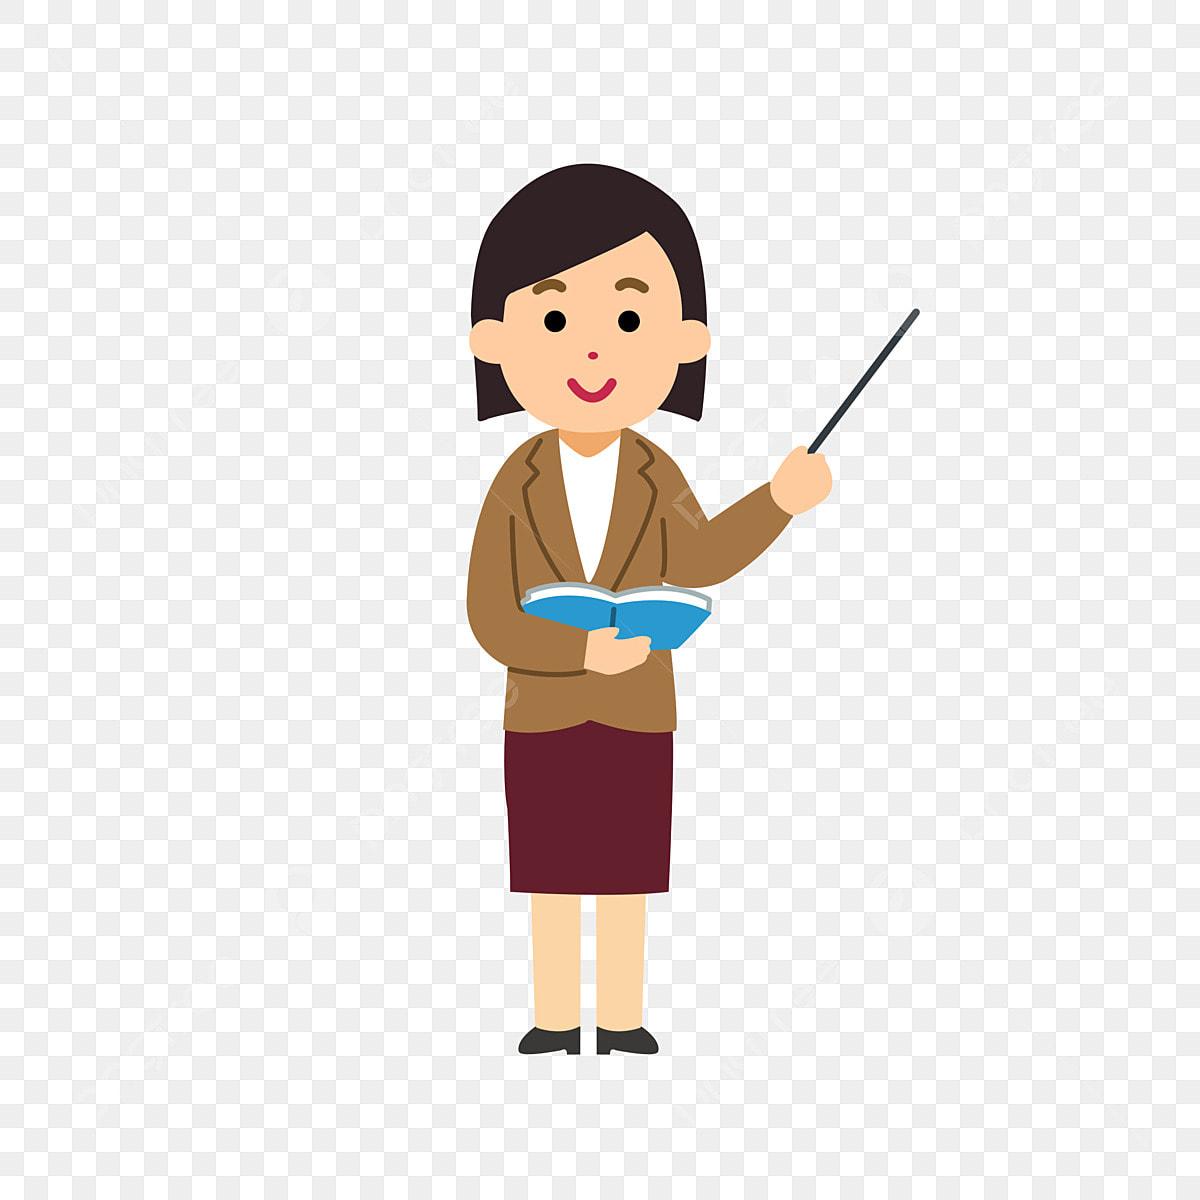 Kartun Guru Guru Wanita Kartun Guru Wanita Tangan Dicat